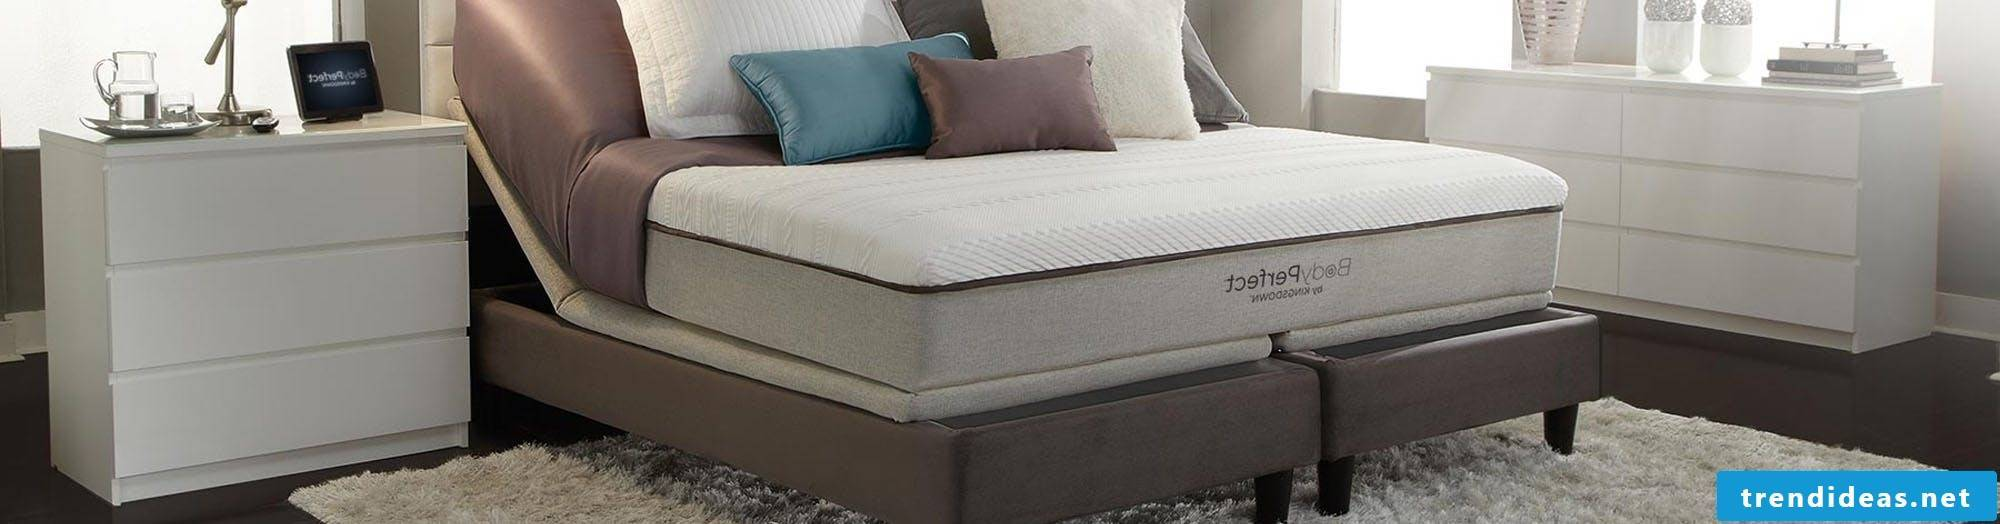 Box spring bed design